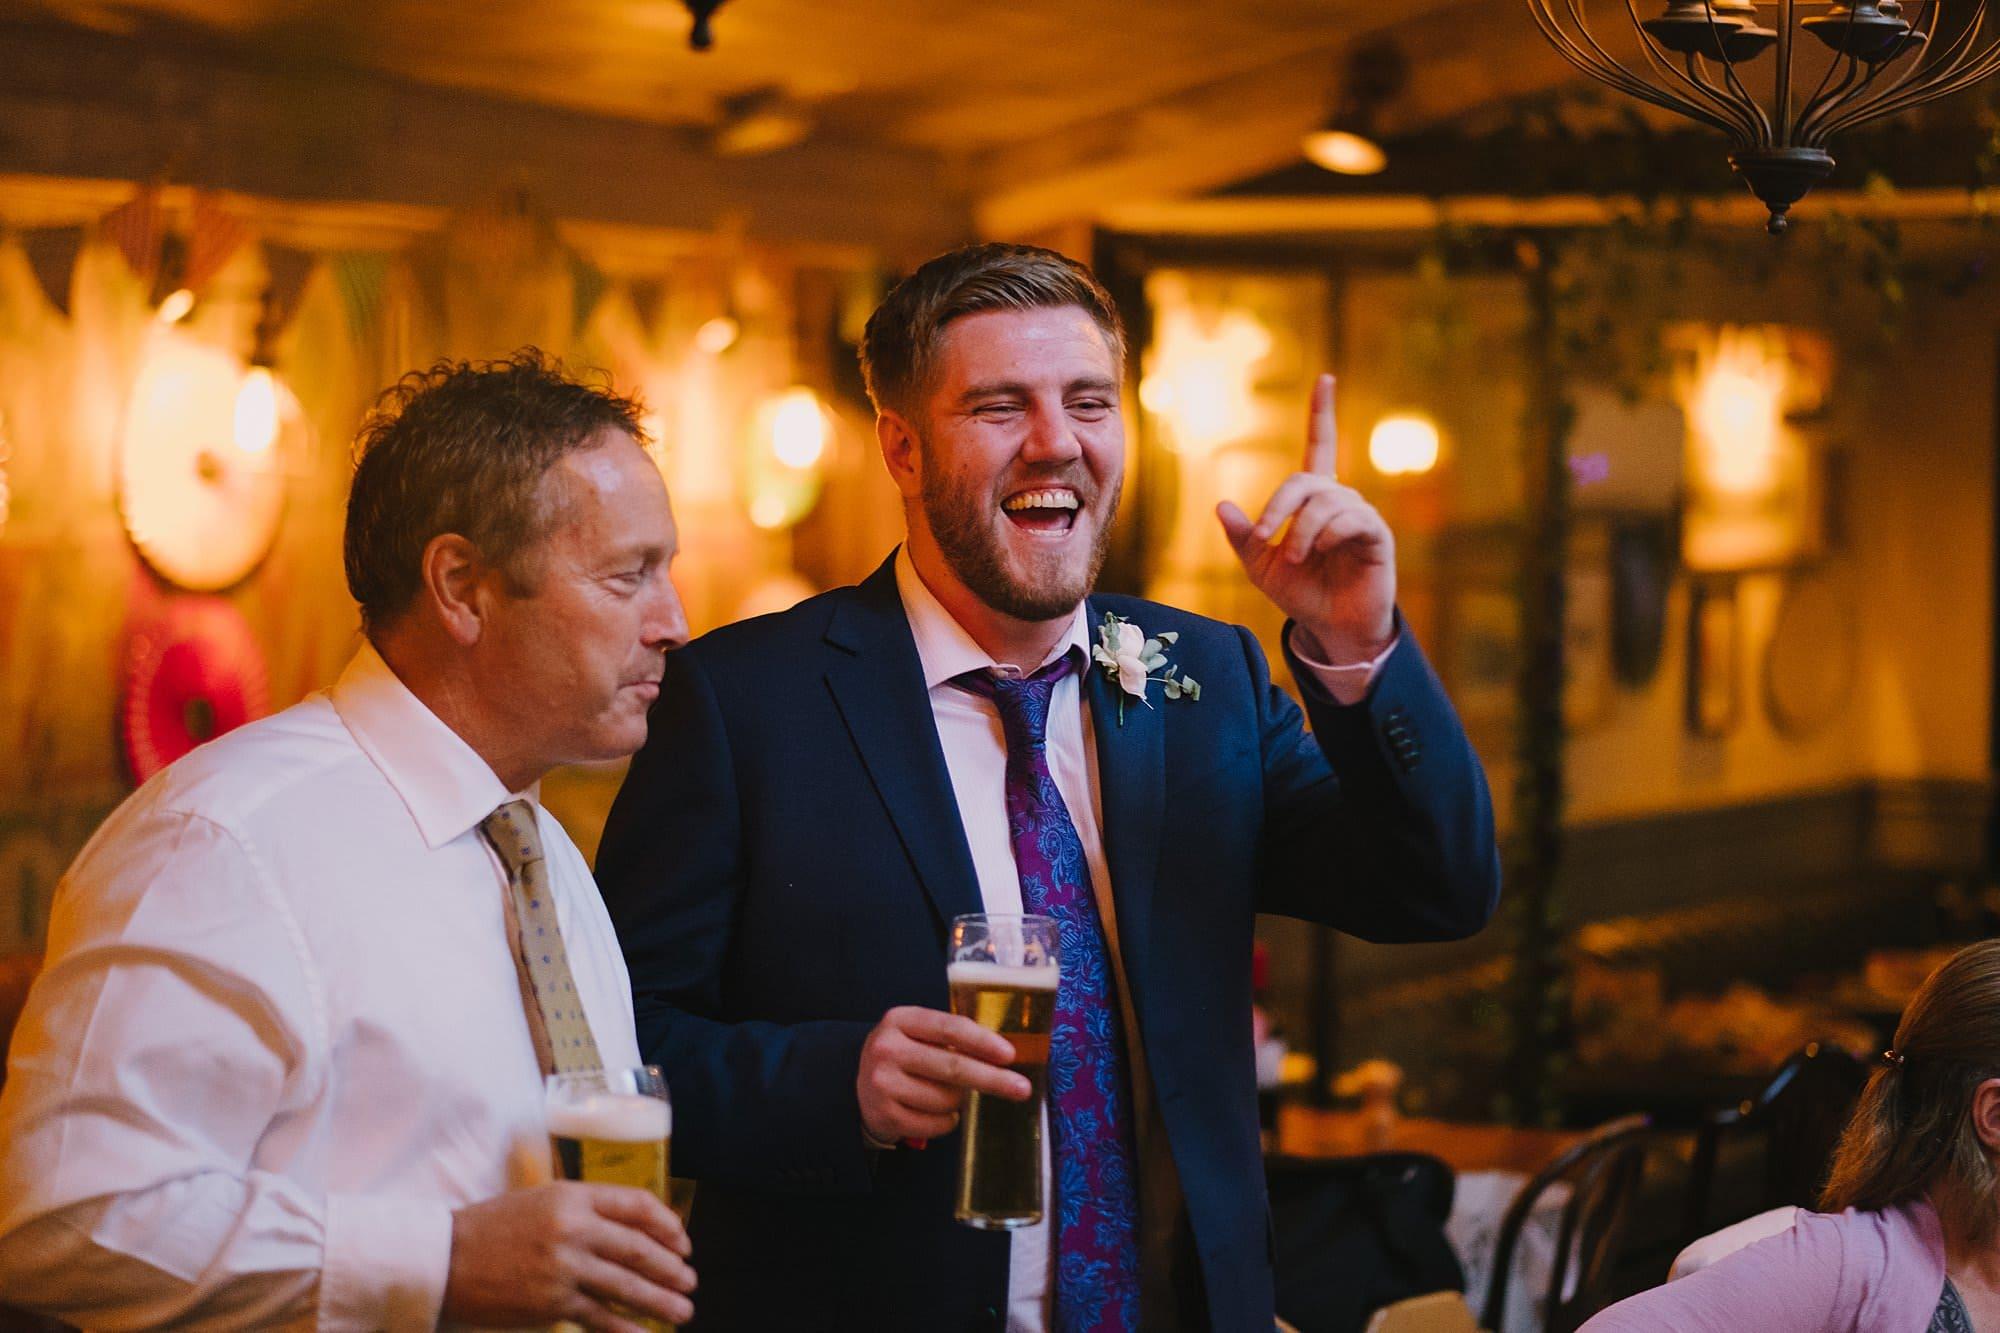 london pub wedding photographer jn 068 - The County Arms Wedding Photographer   Jen & Nick